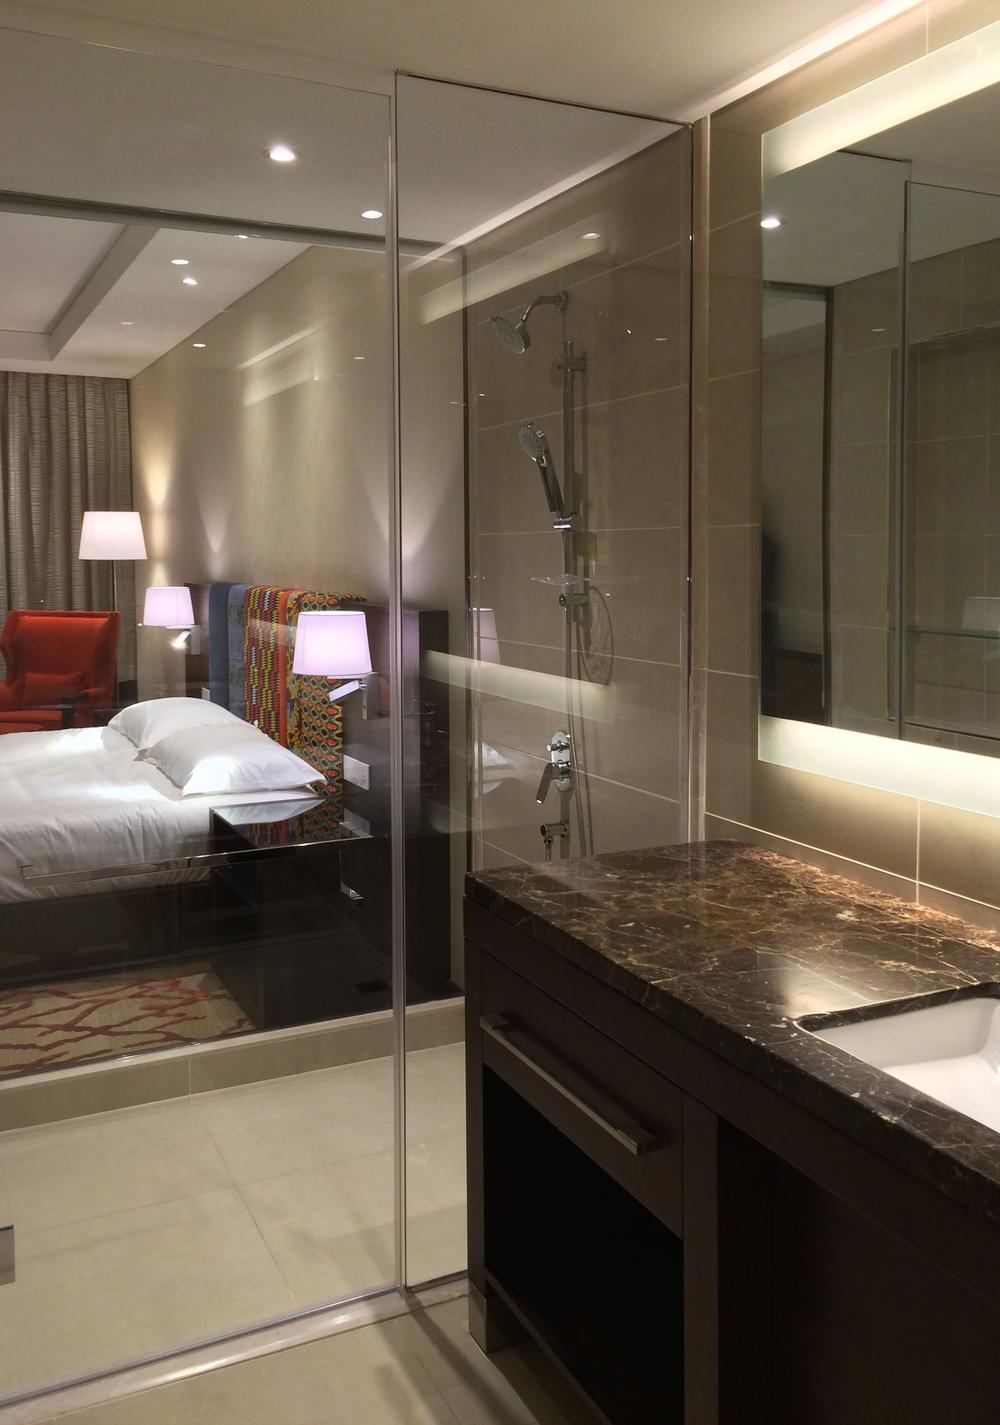 Cobico_Sheraton Conakry_King Bathroom.jpg